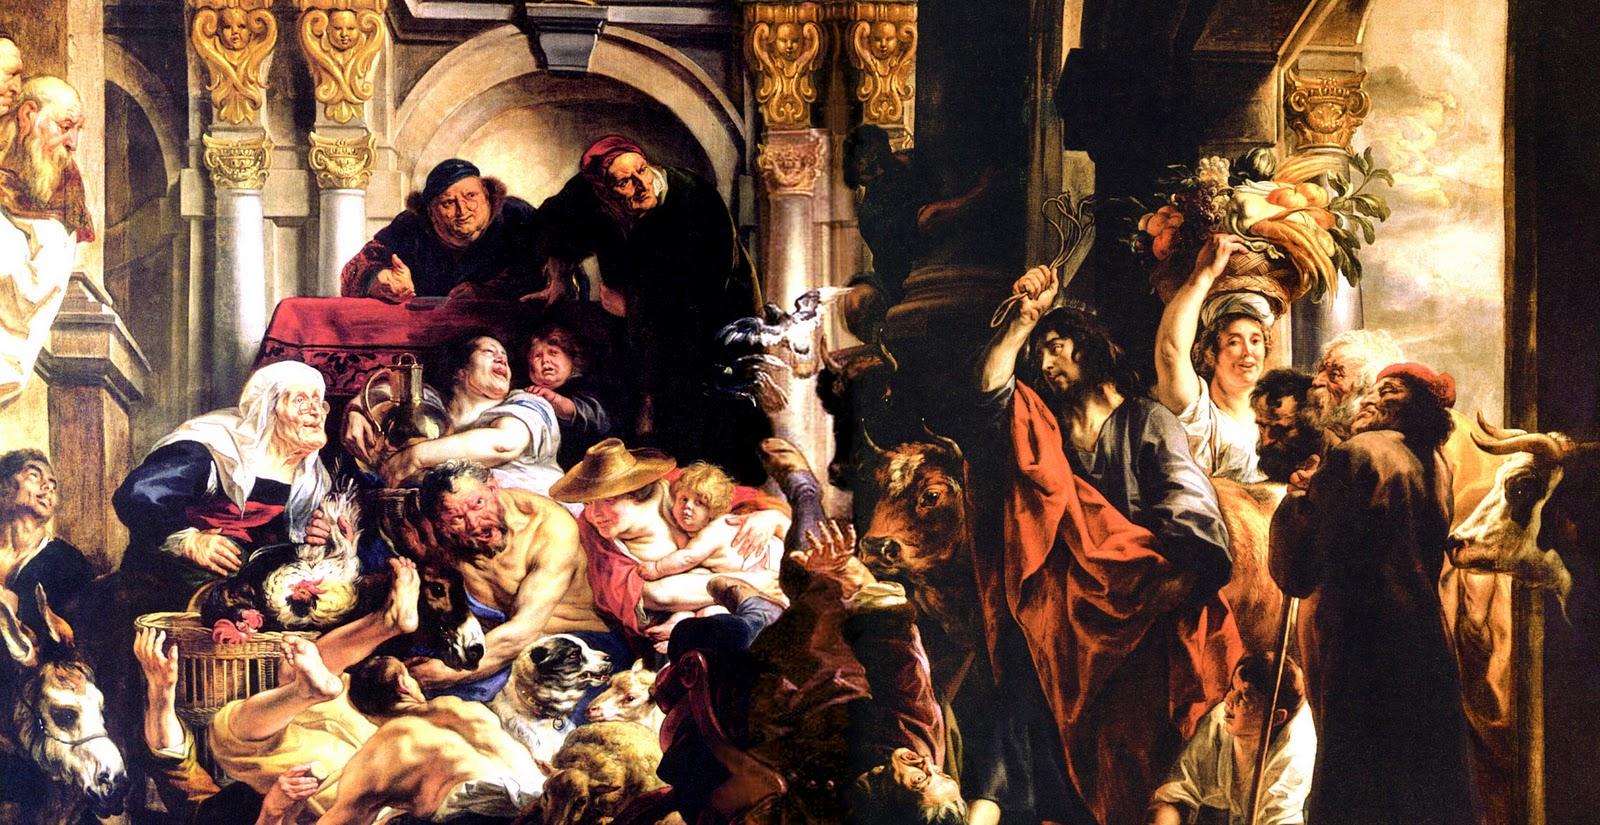 Christ_Driving_Merchants_From_Temple_Jacob_Jordaens1650-1